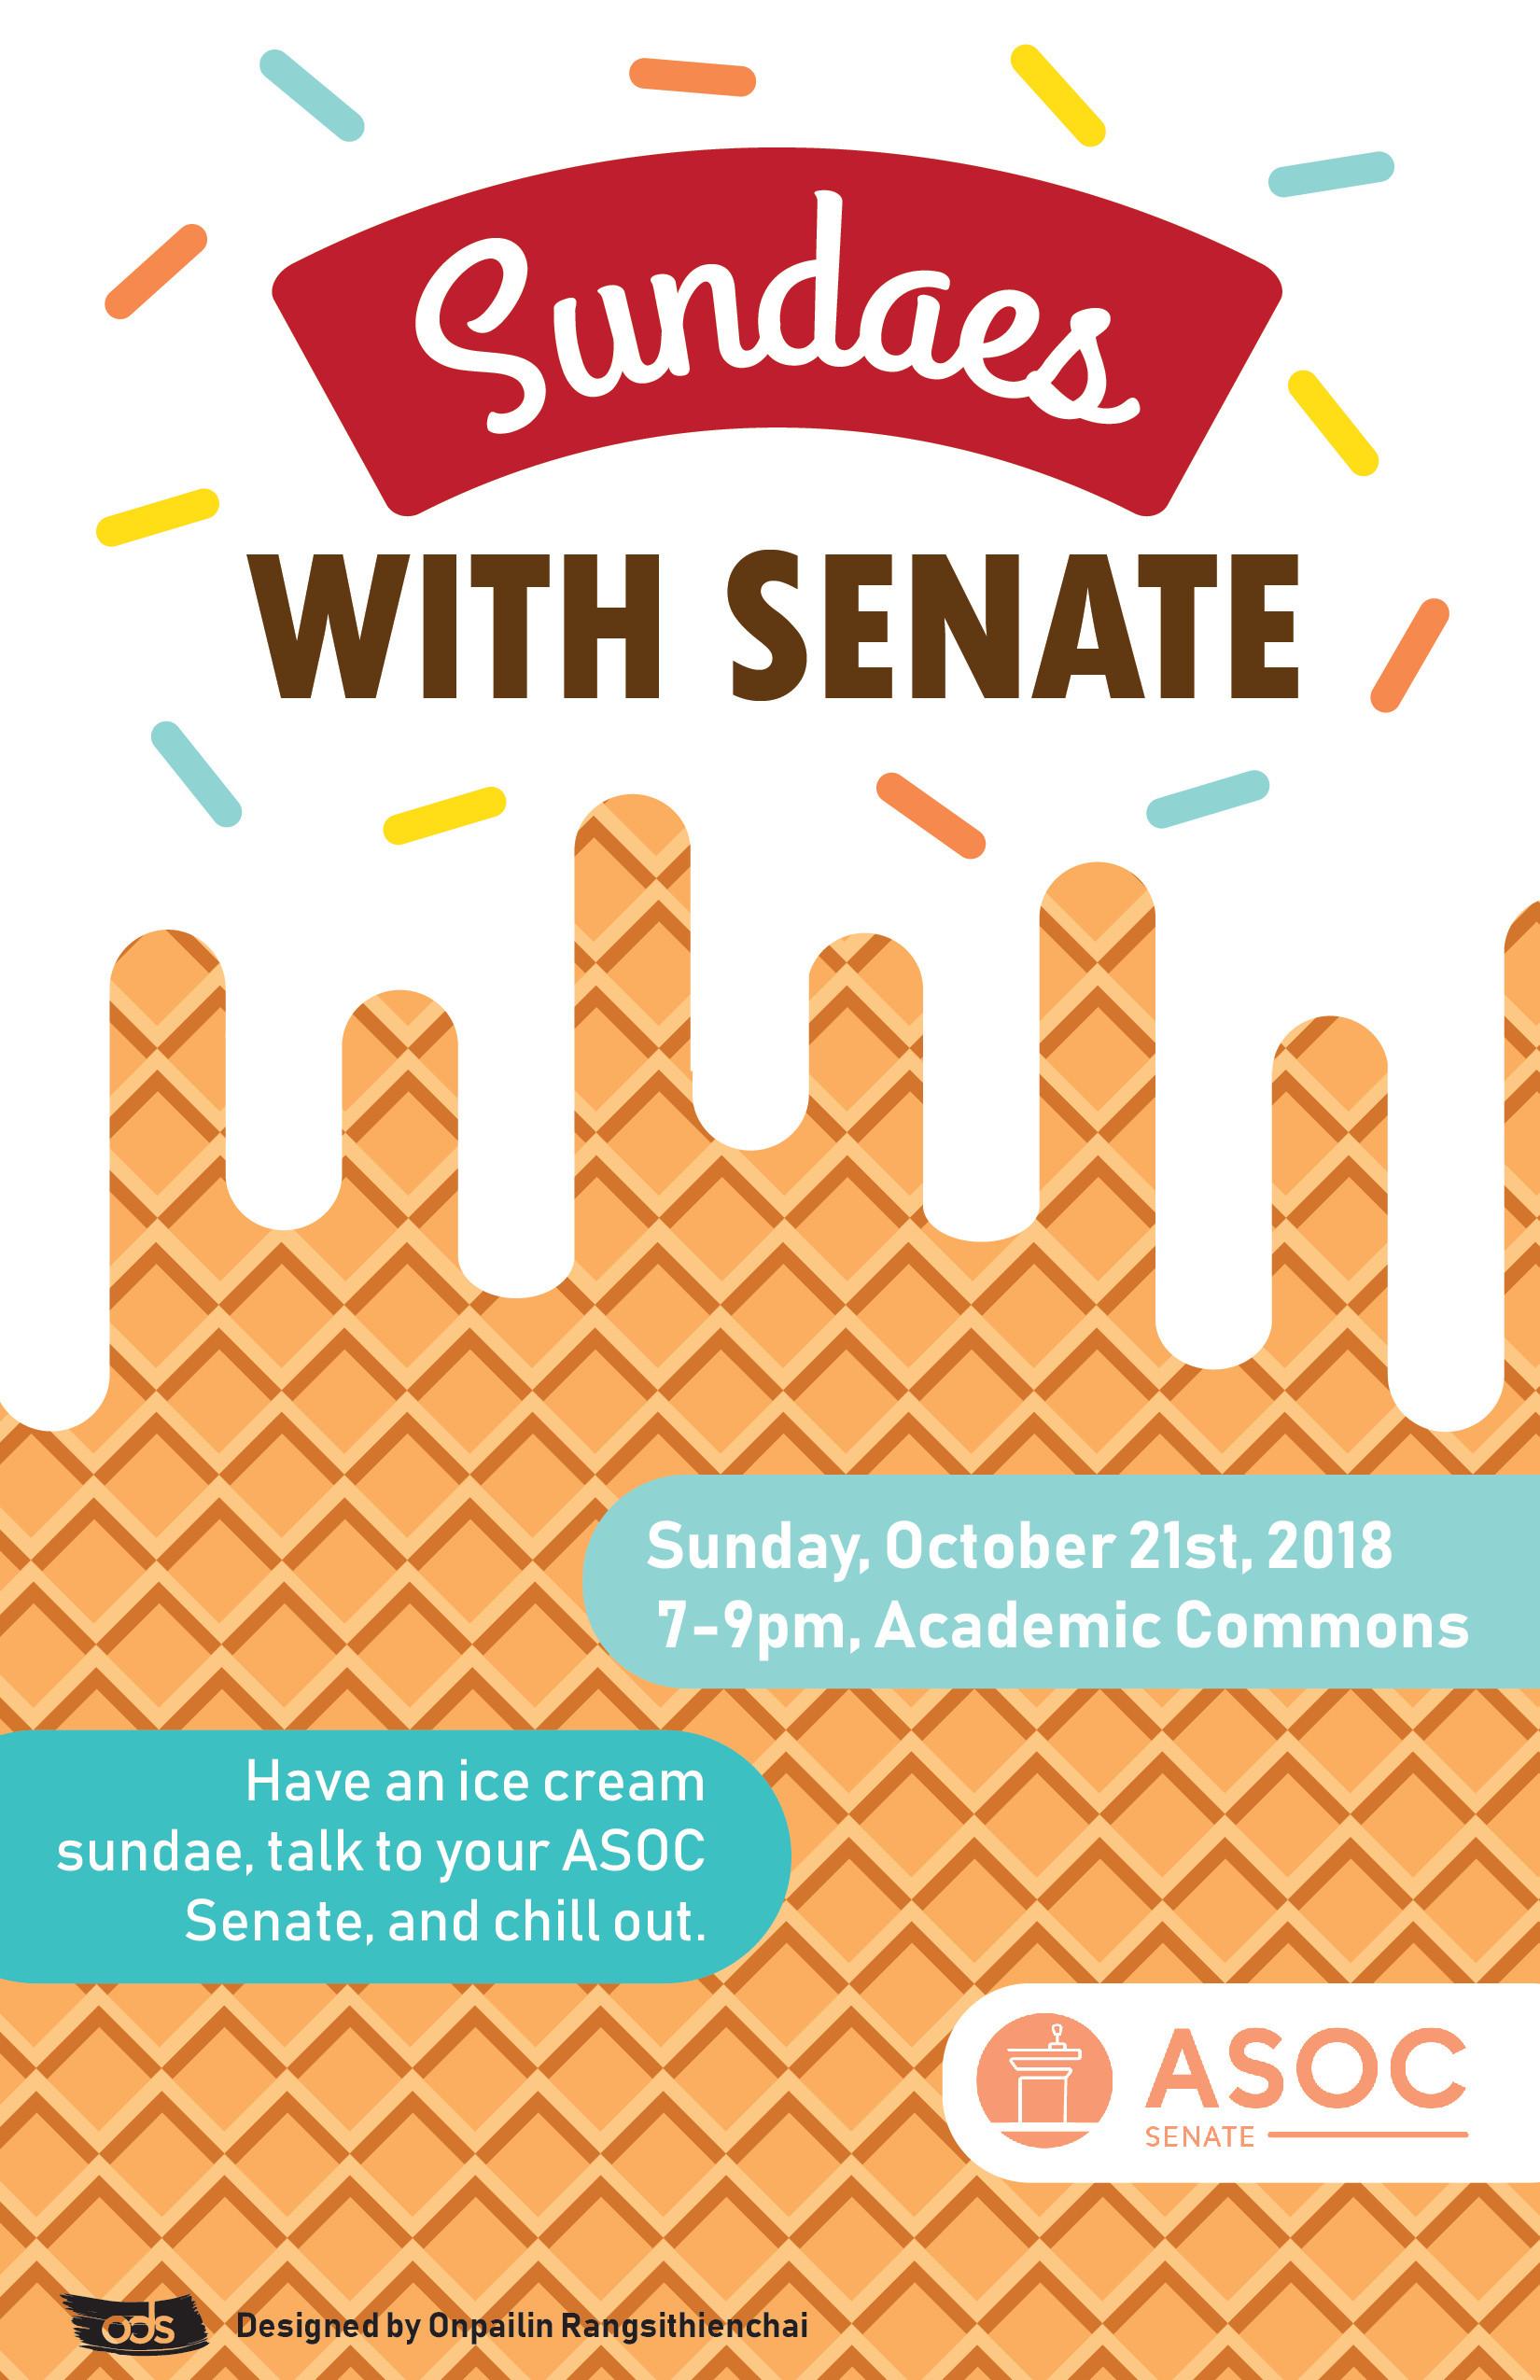 Sundaes with Senate event